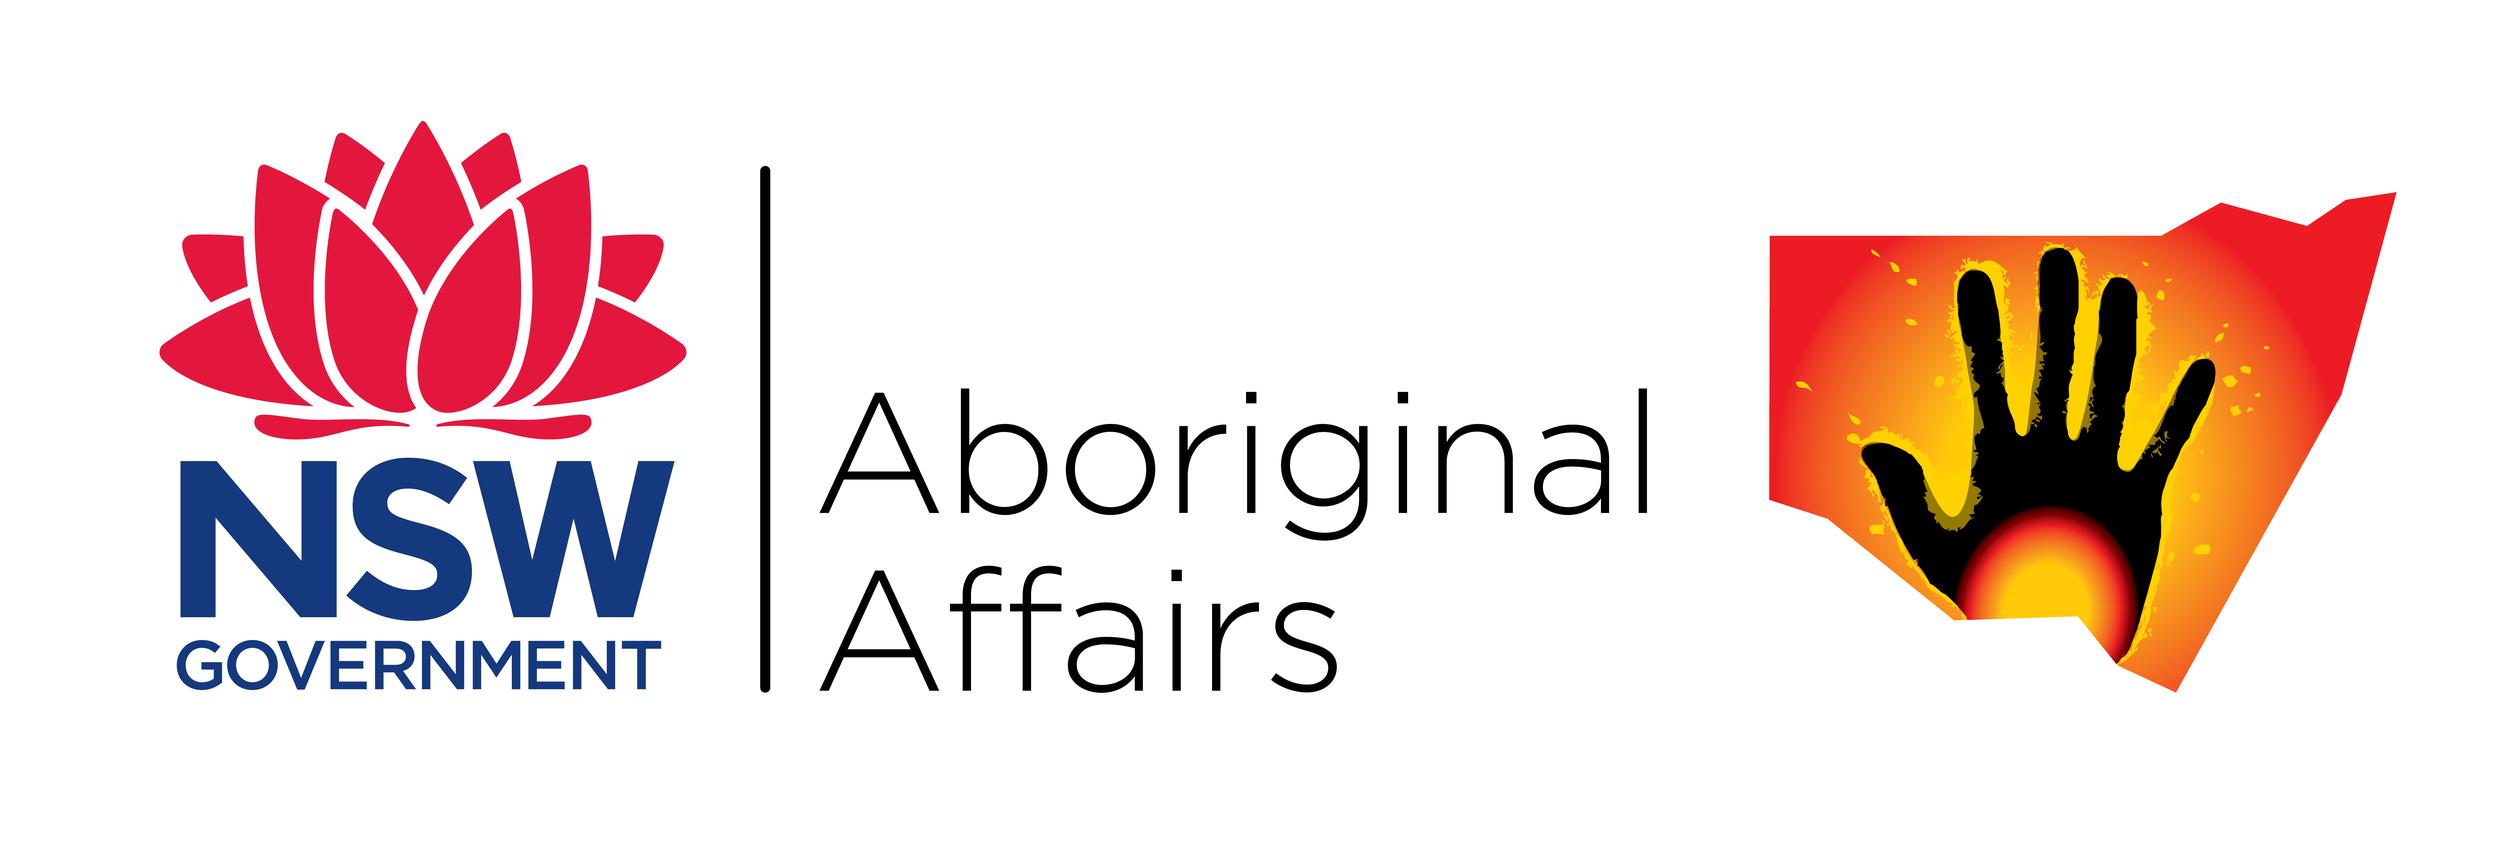 DoE_Aboriginal Affairs Logo_CMYK.png